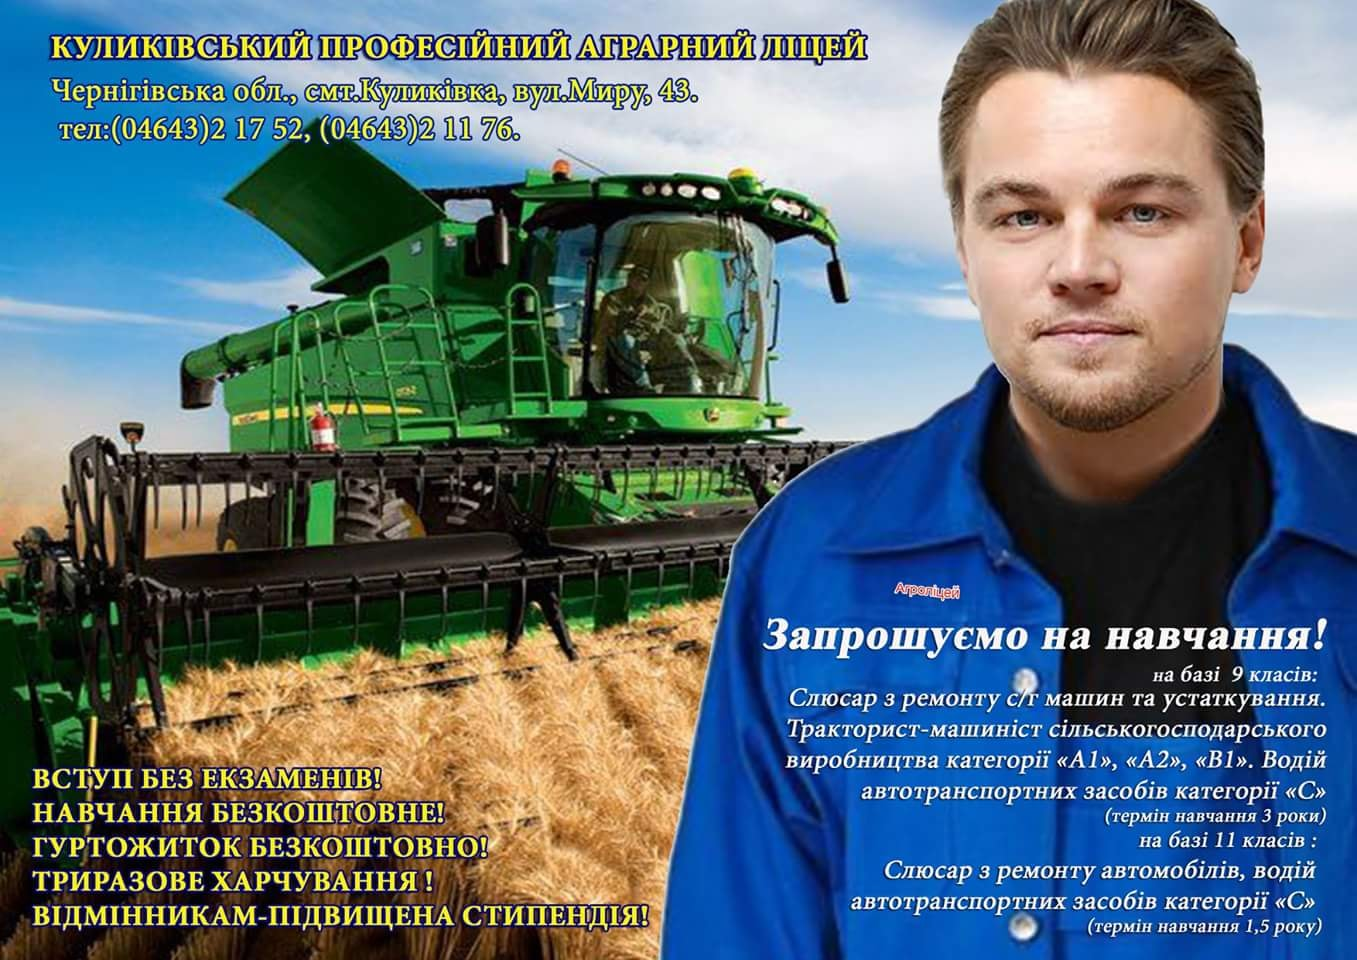 https://ic.pics.livejournal.com/yuripasholok/765139/8854742/8854742_original.jpg